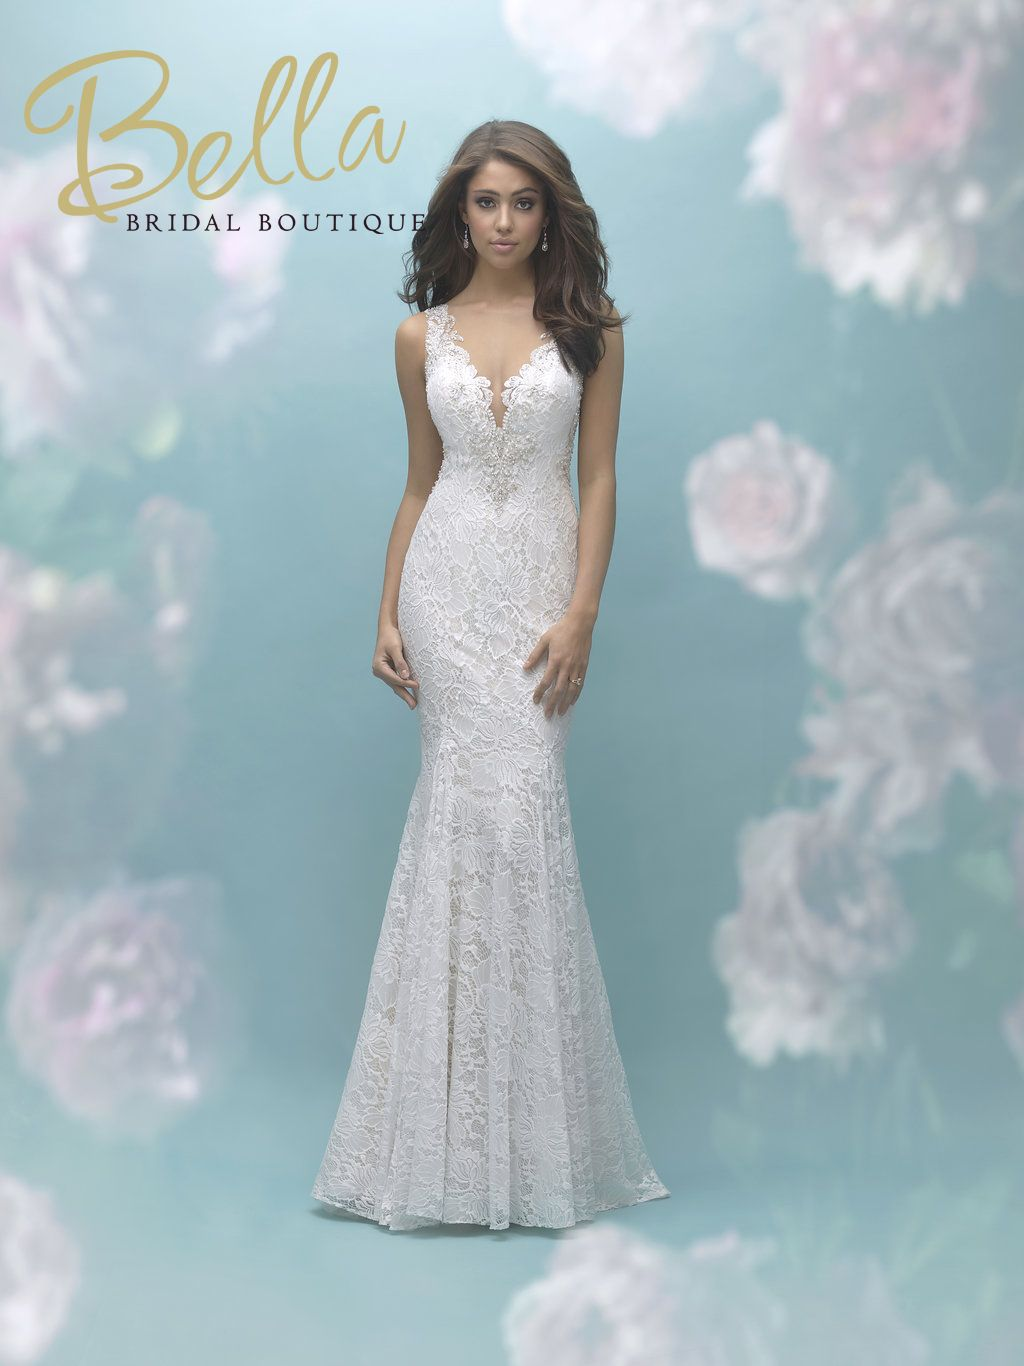 Unusual Wedding Dresses In Mn Images - Wedding Ideas - memiocall.com